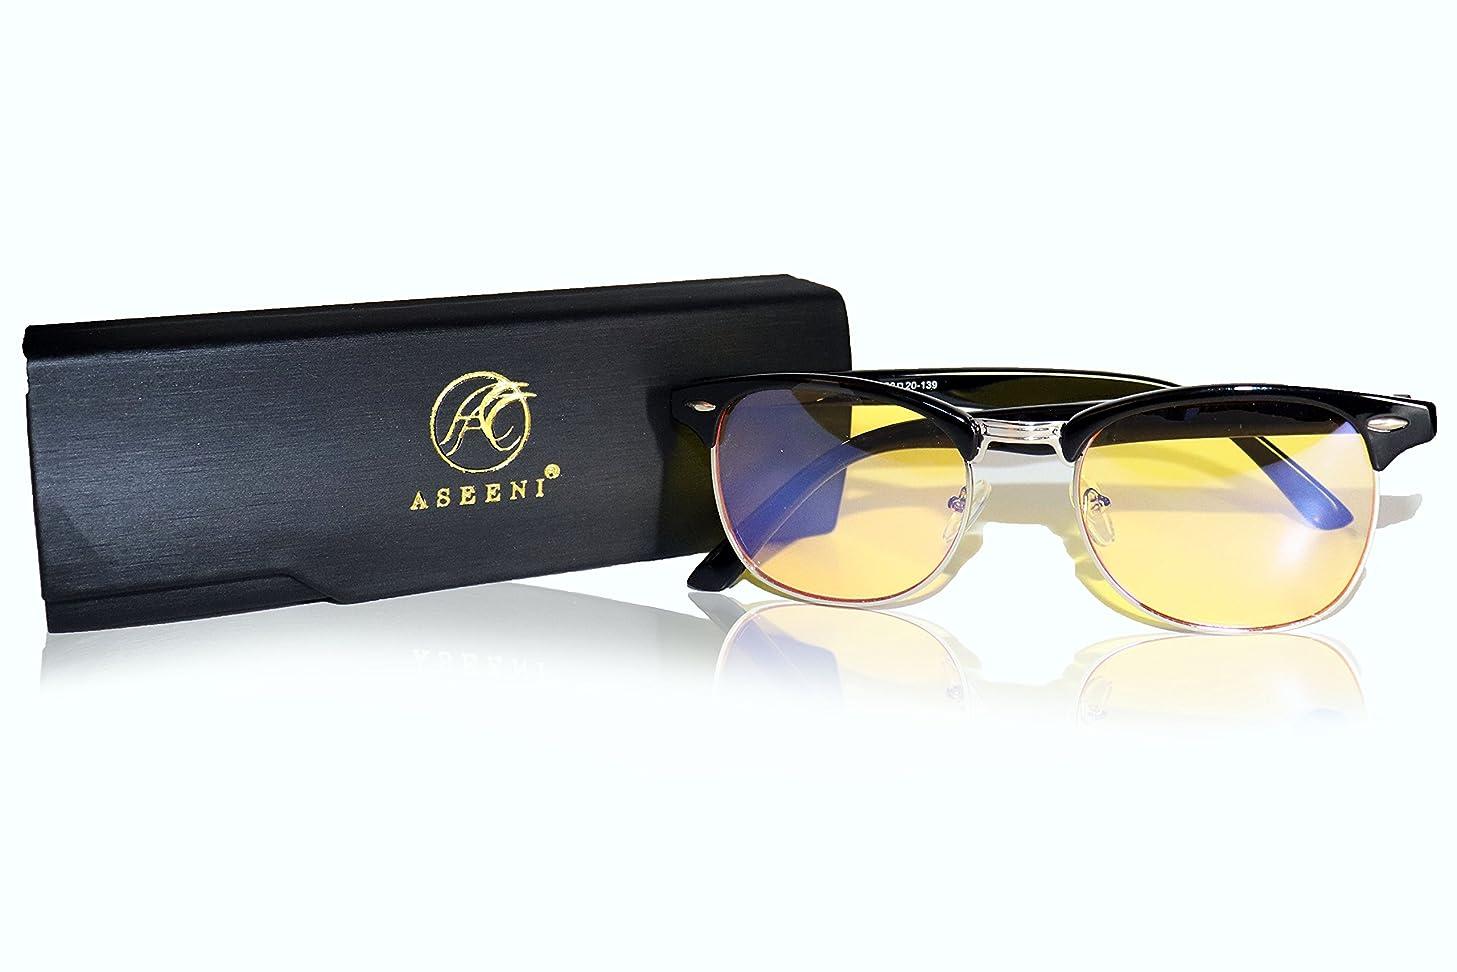 Aseeni Blue Light Blocking Glasses Computer Glasses [Better Sleep] Blue Light Filter Blocking UV Blue Blocking Glasses Orange Lens Reduce Eye Fatigue